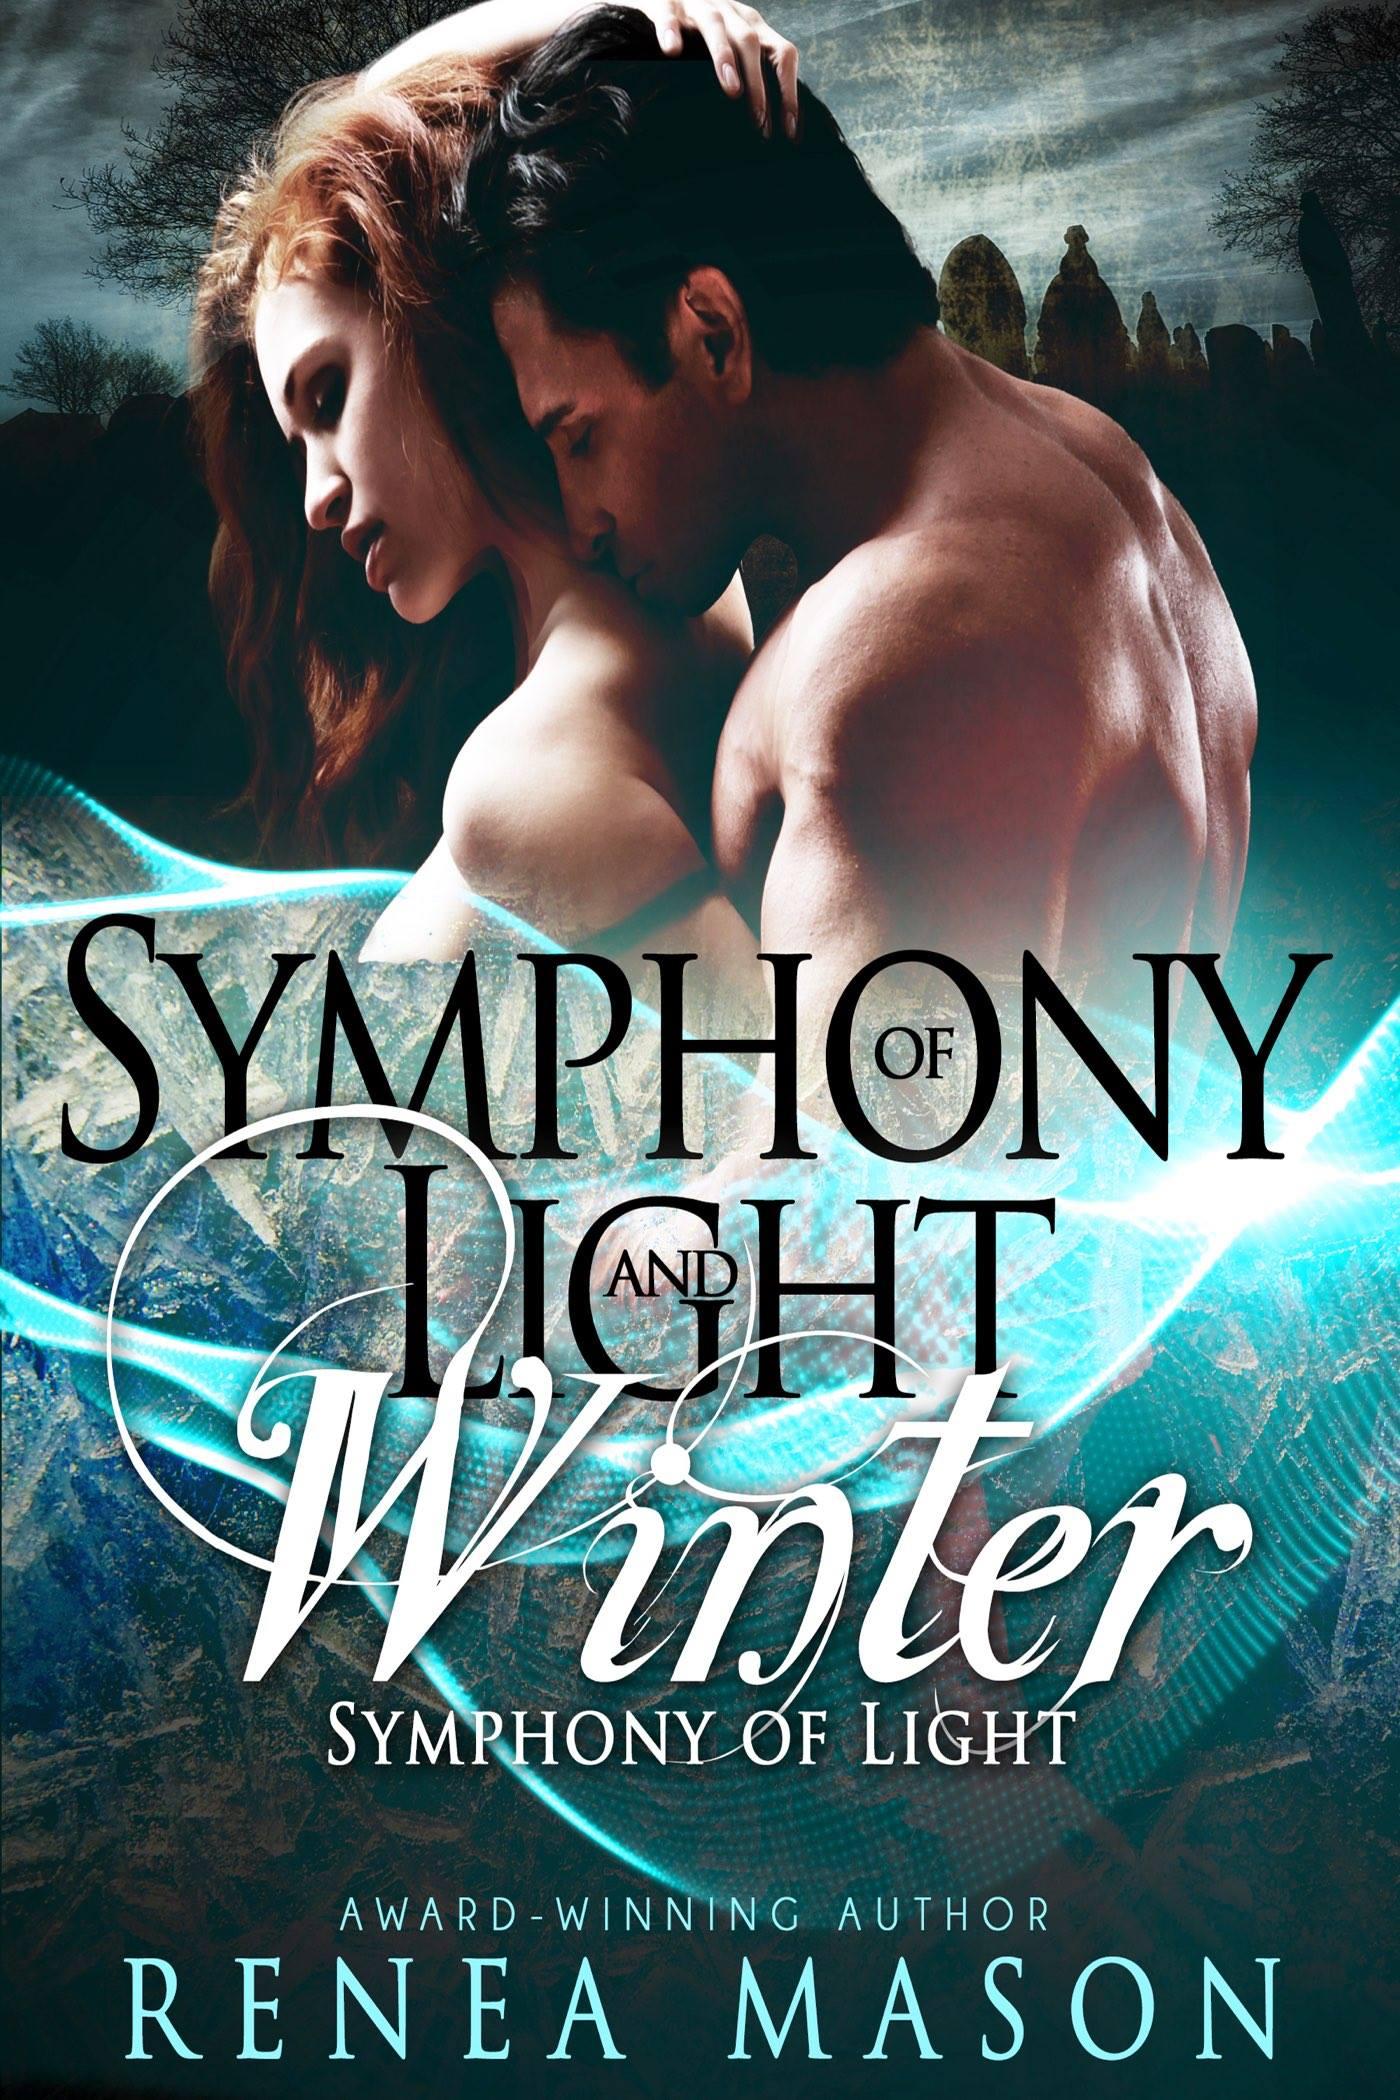 Symphony of Light and Winter by Renea Mason